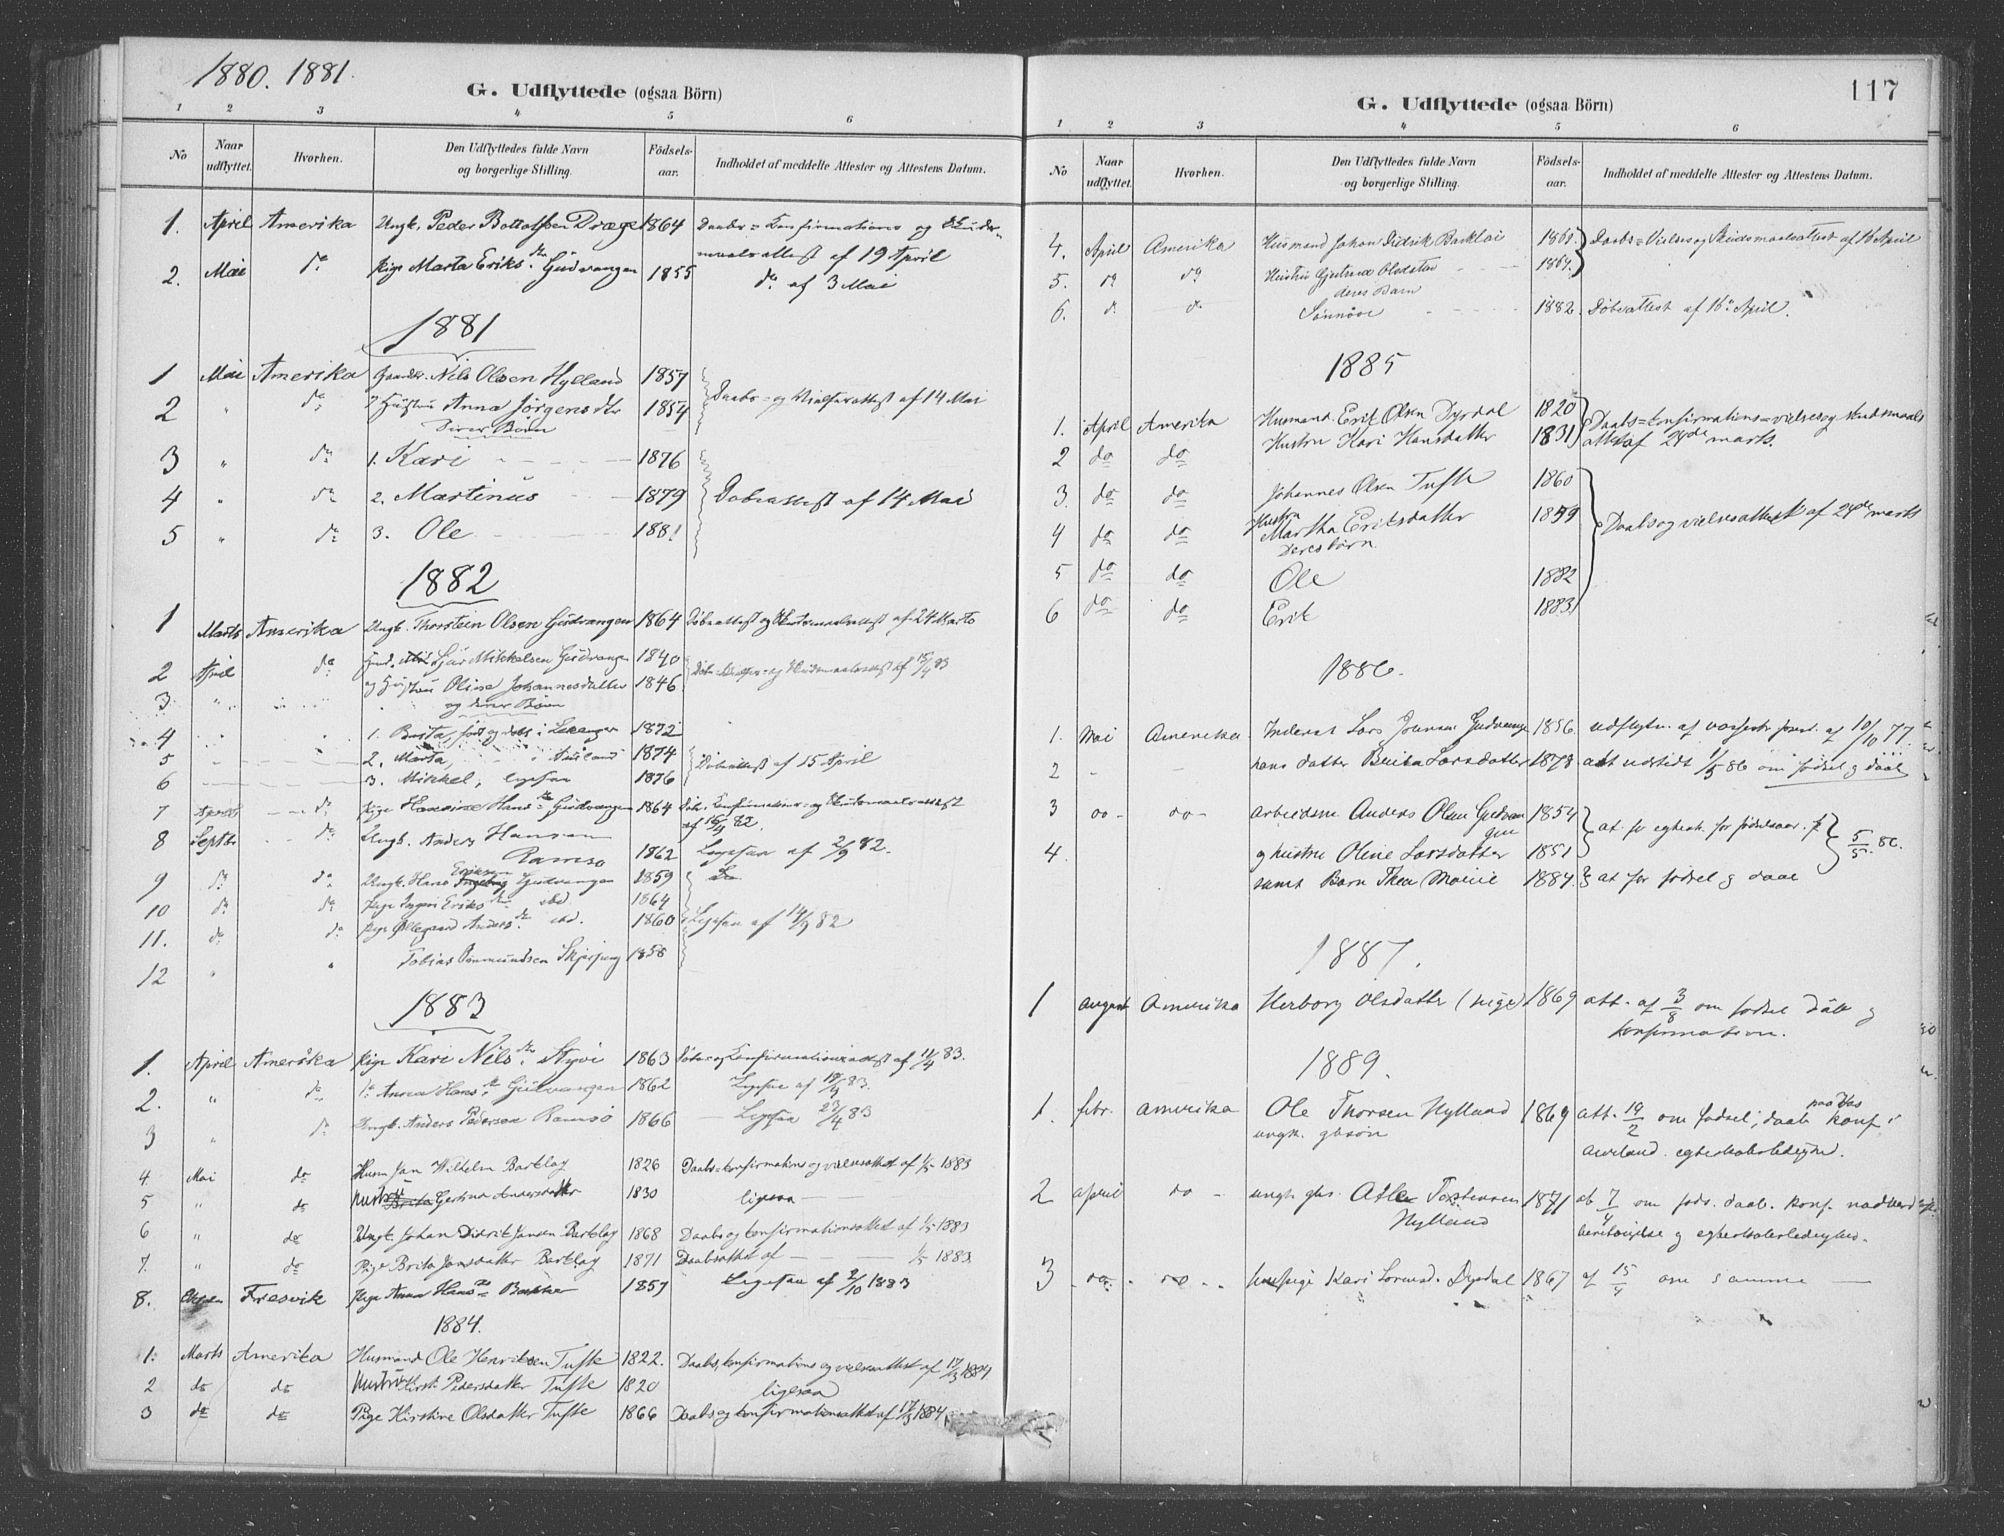 SAB, Aurland sokneprestembete, H/Ha/Had/L0001: Ministerialbok nr. D  1, 1880-1903, s. 117